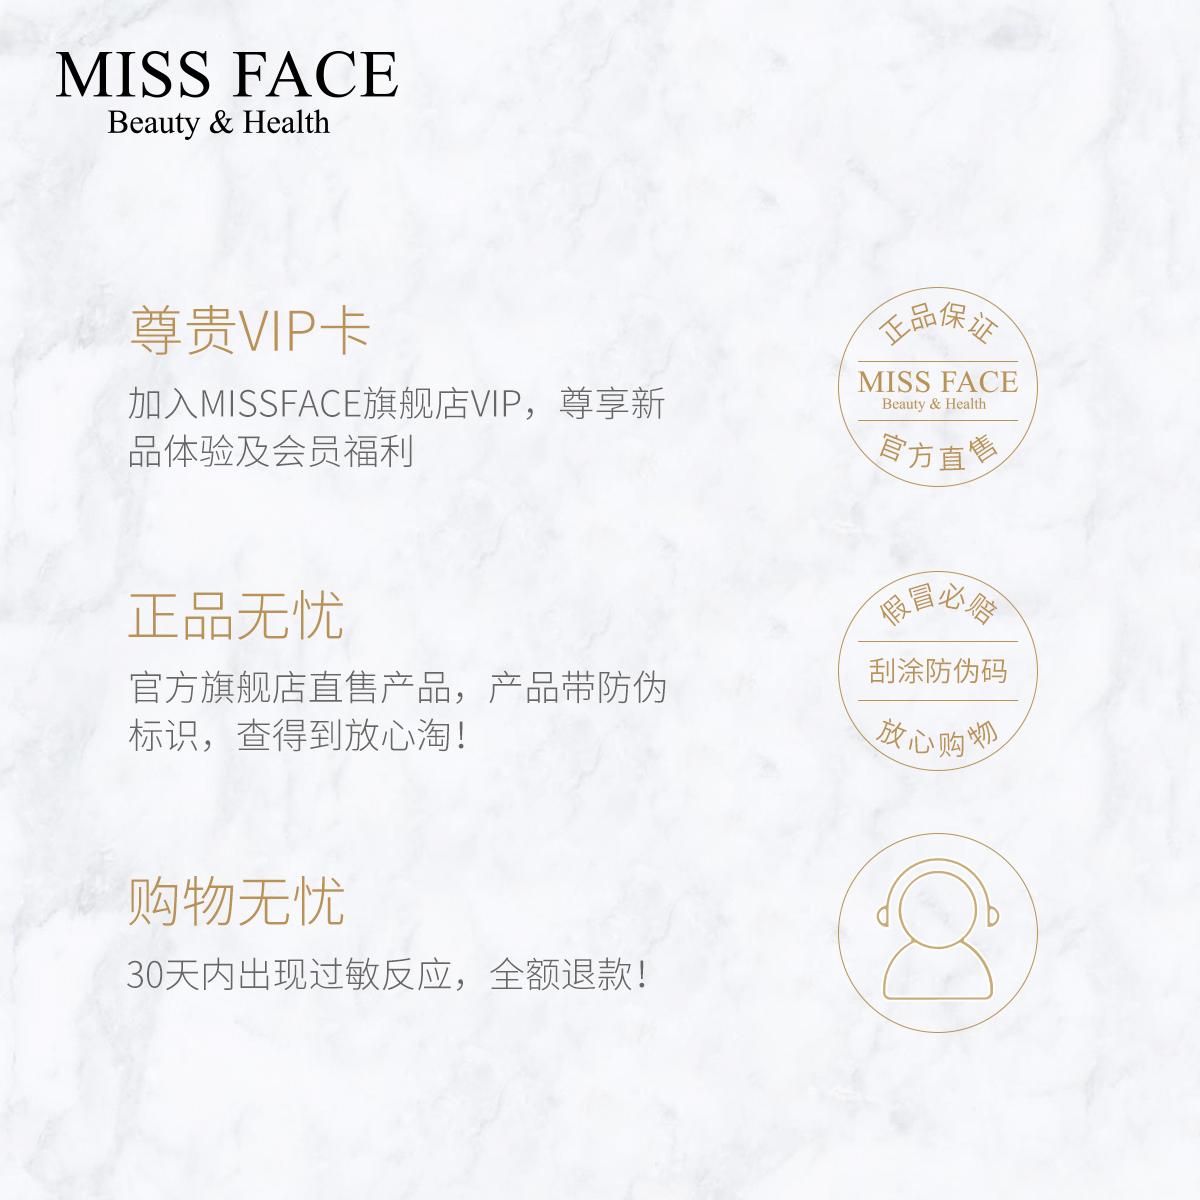 Miss face豆乳洗面奶女深层清洁补水保湿控油卸妆洁面乳女学生款